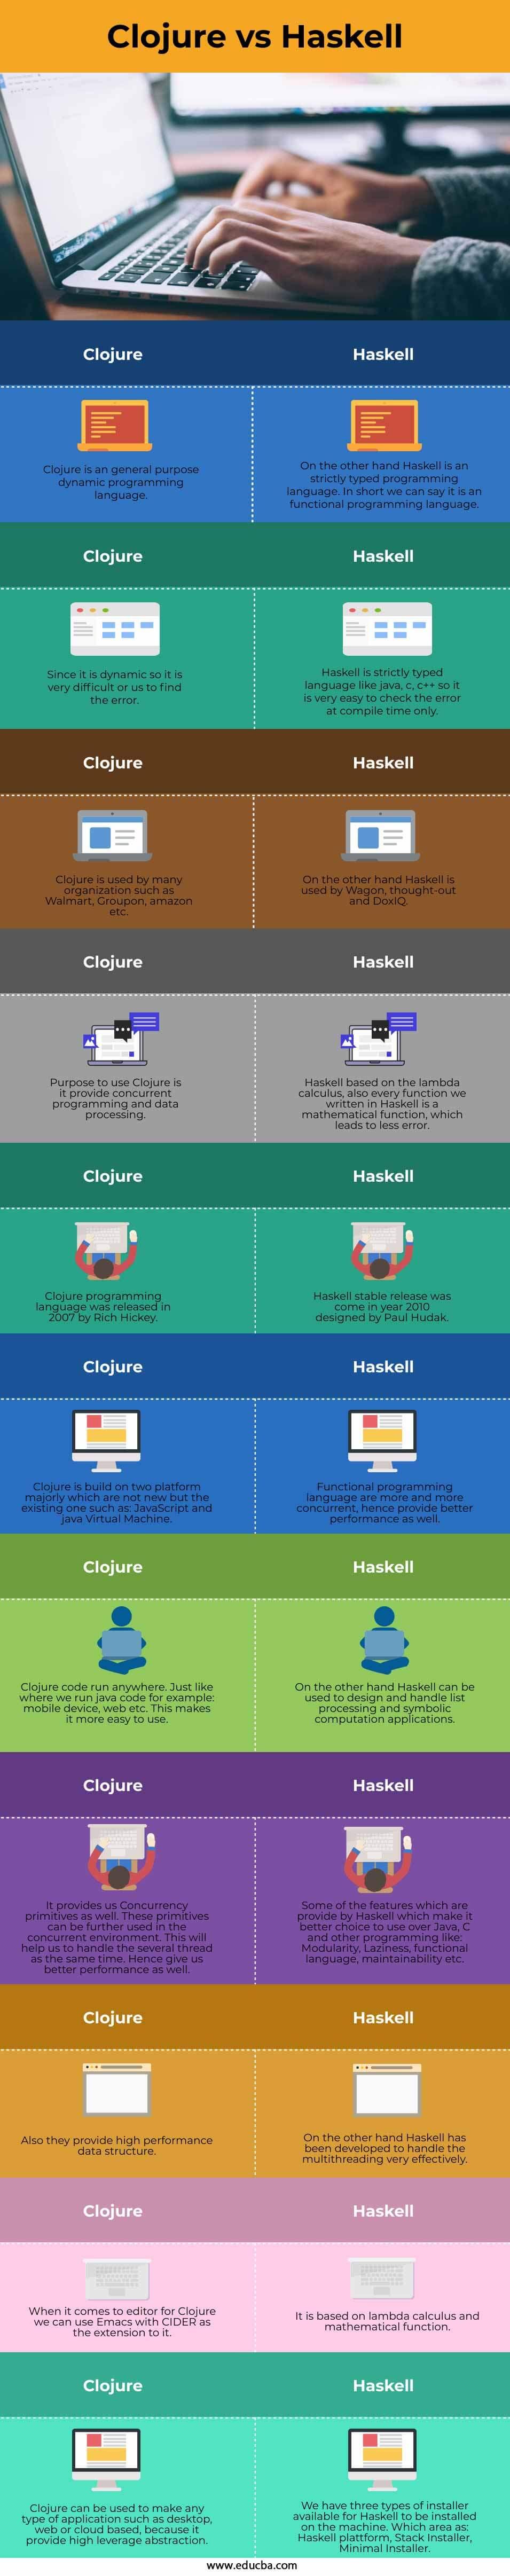 Clojure-vs-Haskell-info